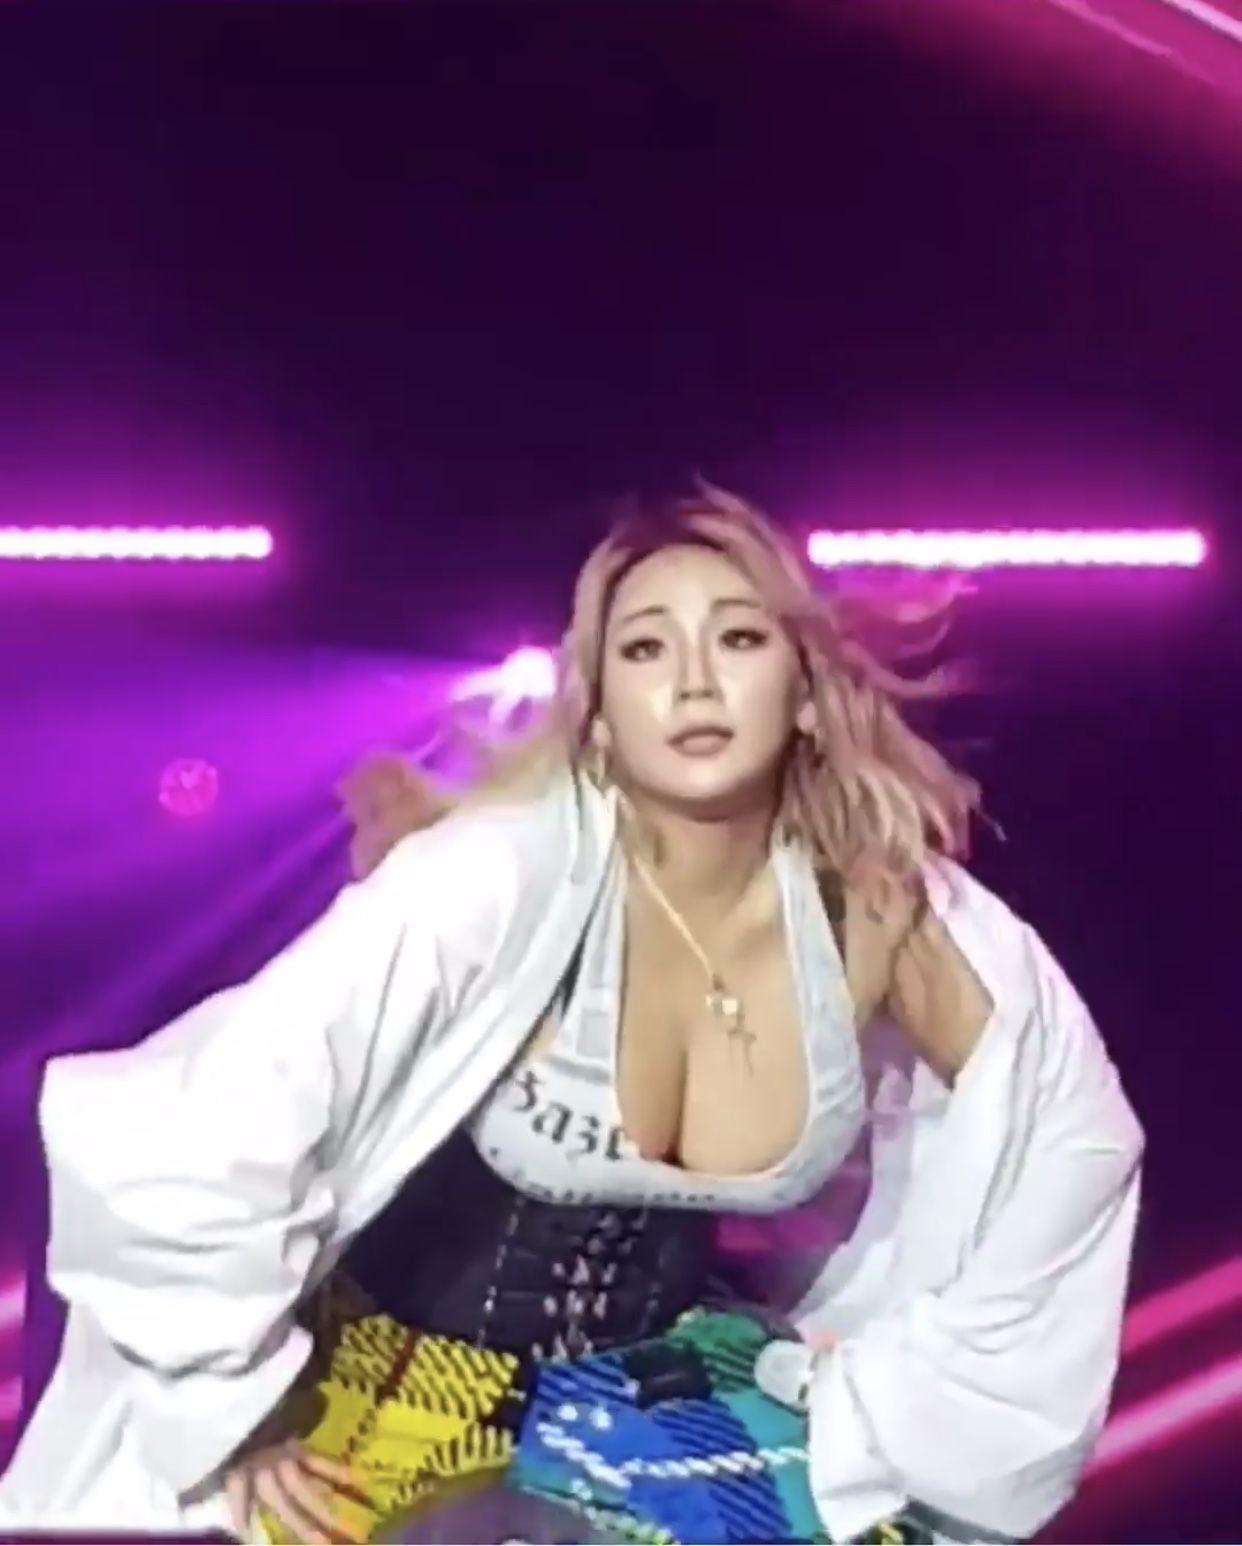 Pin By Tammie Woo On Cl 2ne1 Cl 2ne1 2ne1 Bad Girl